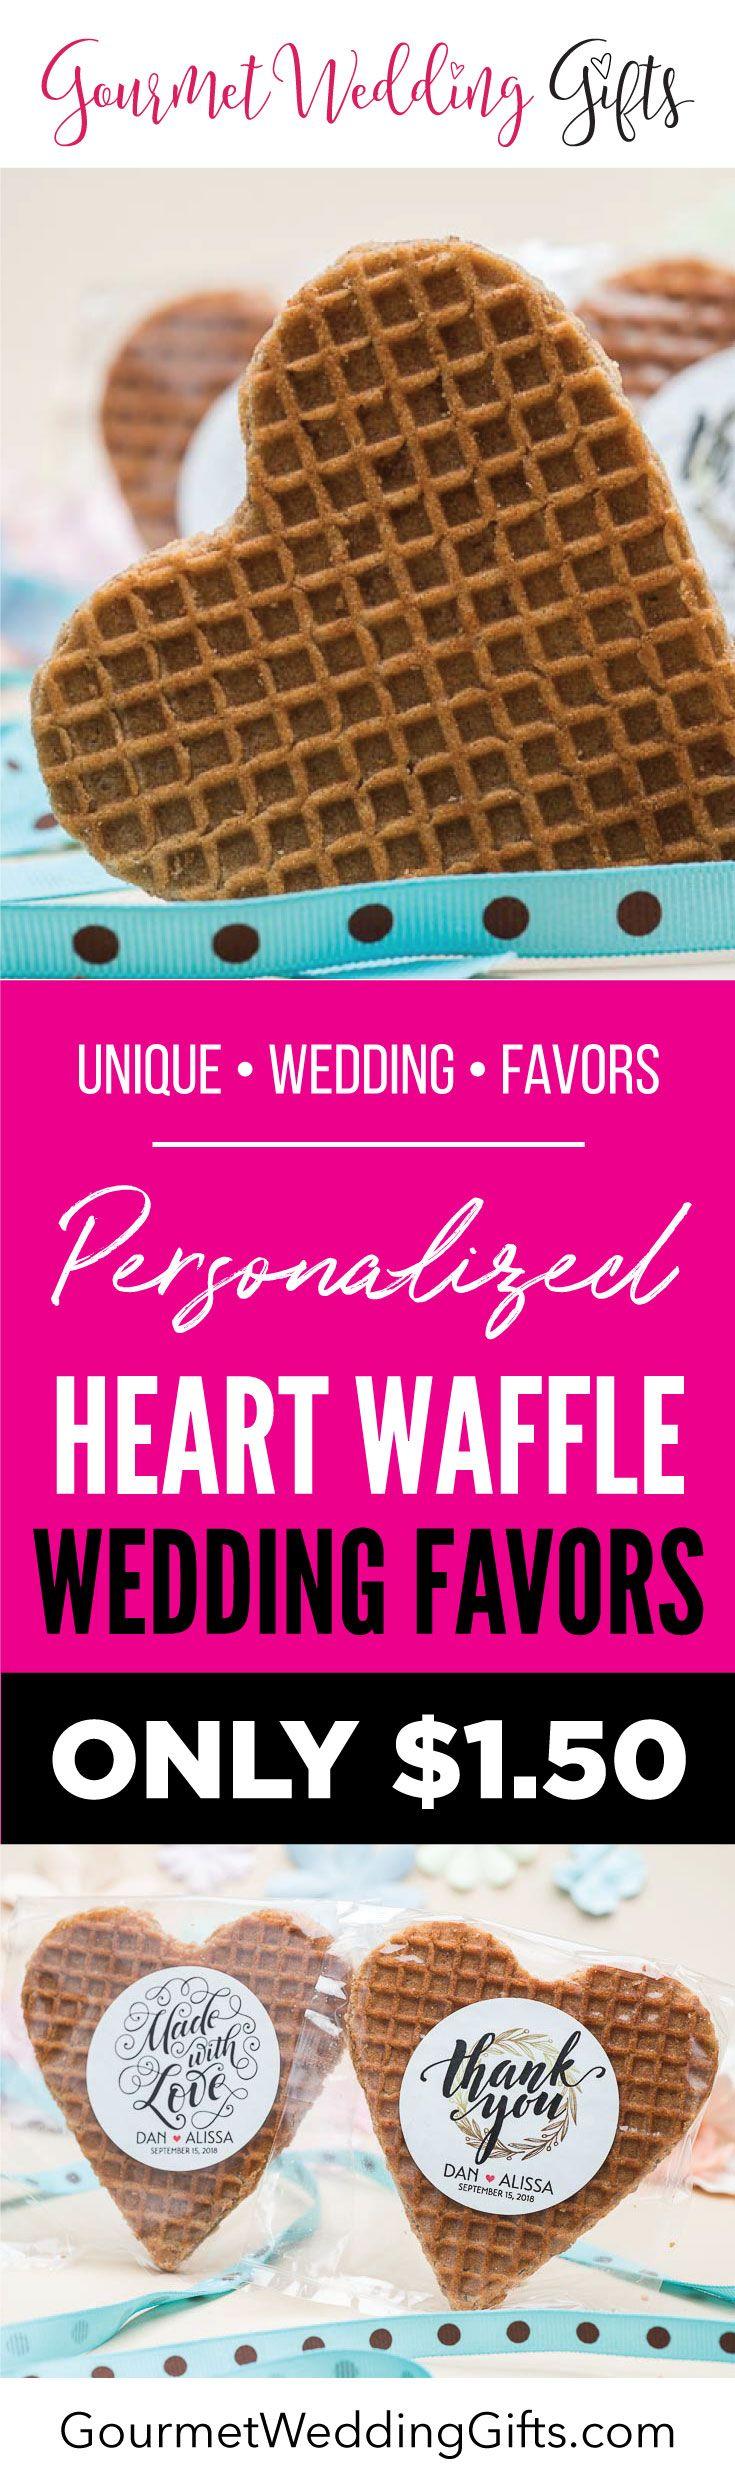 Personalized Heart Stroopwafel Wedding Favors | Unique Edible ...